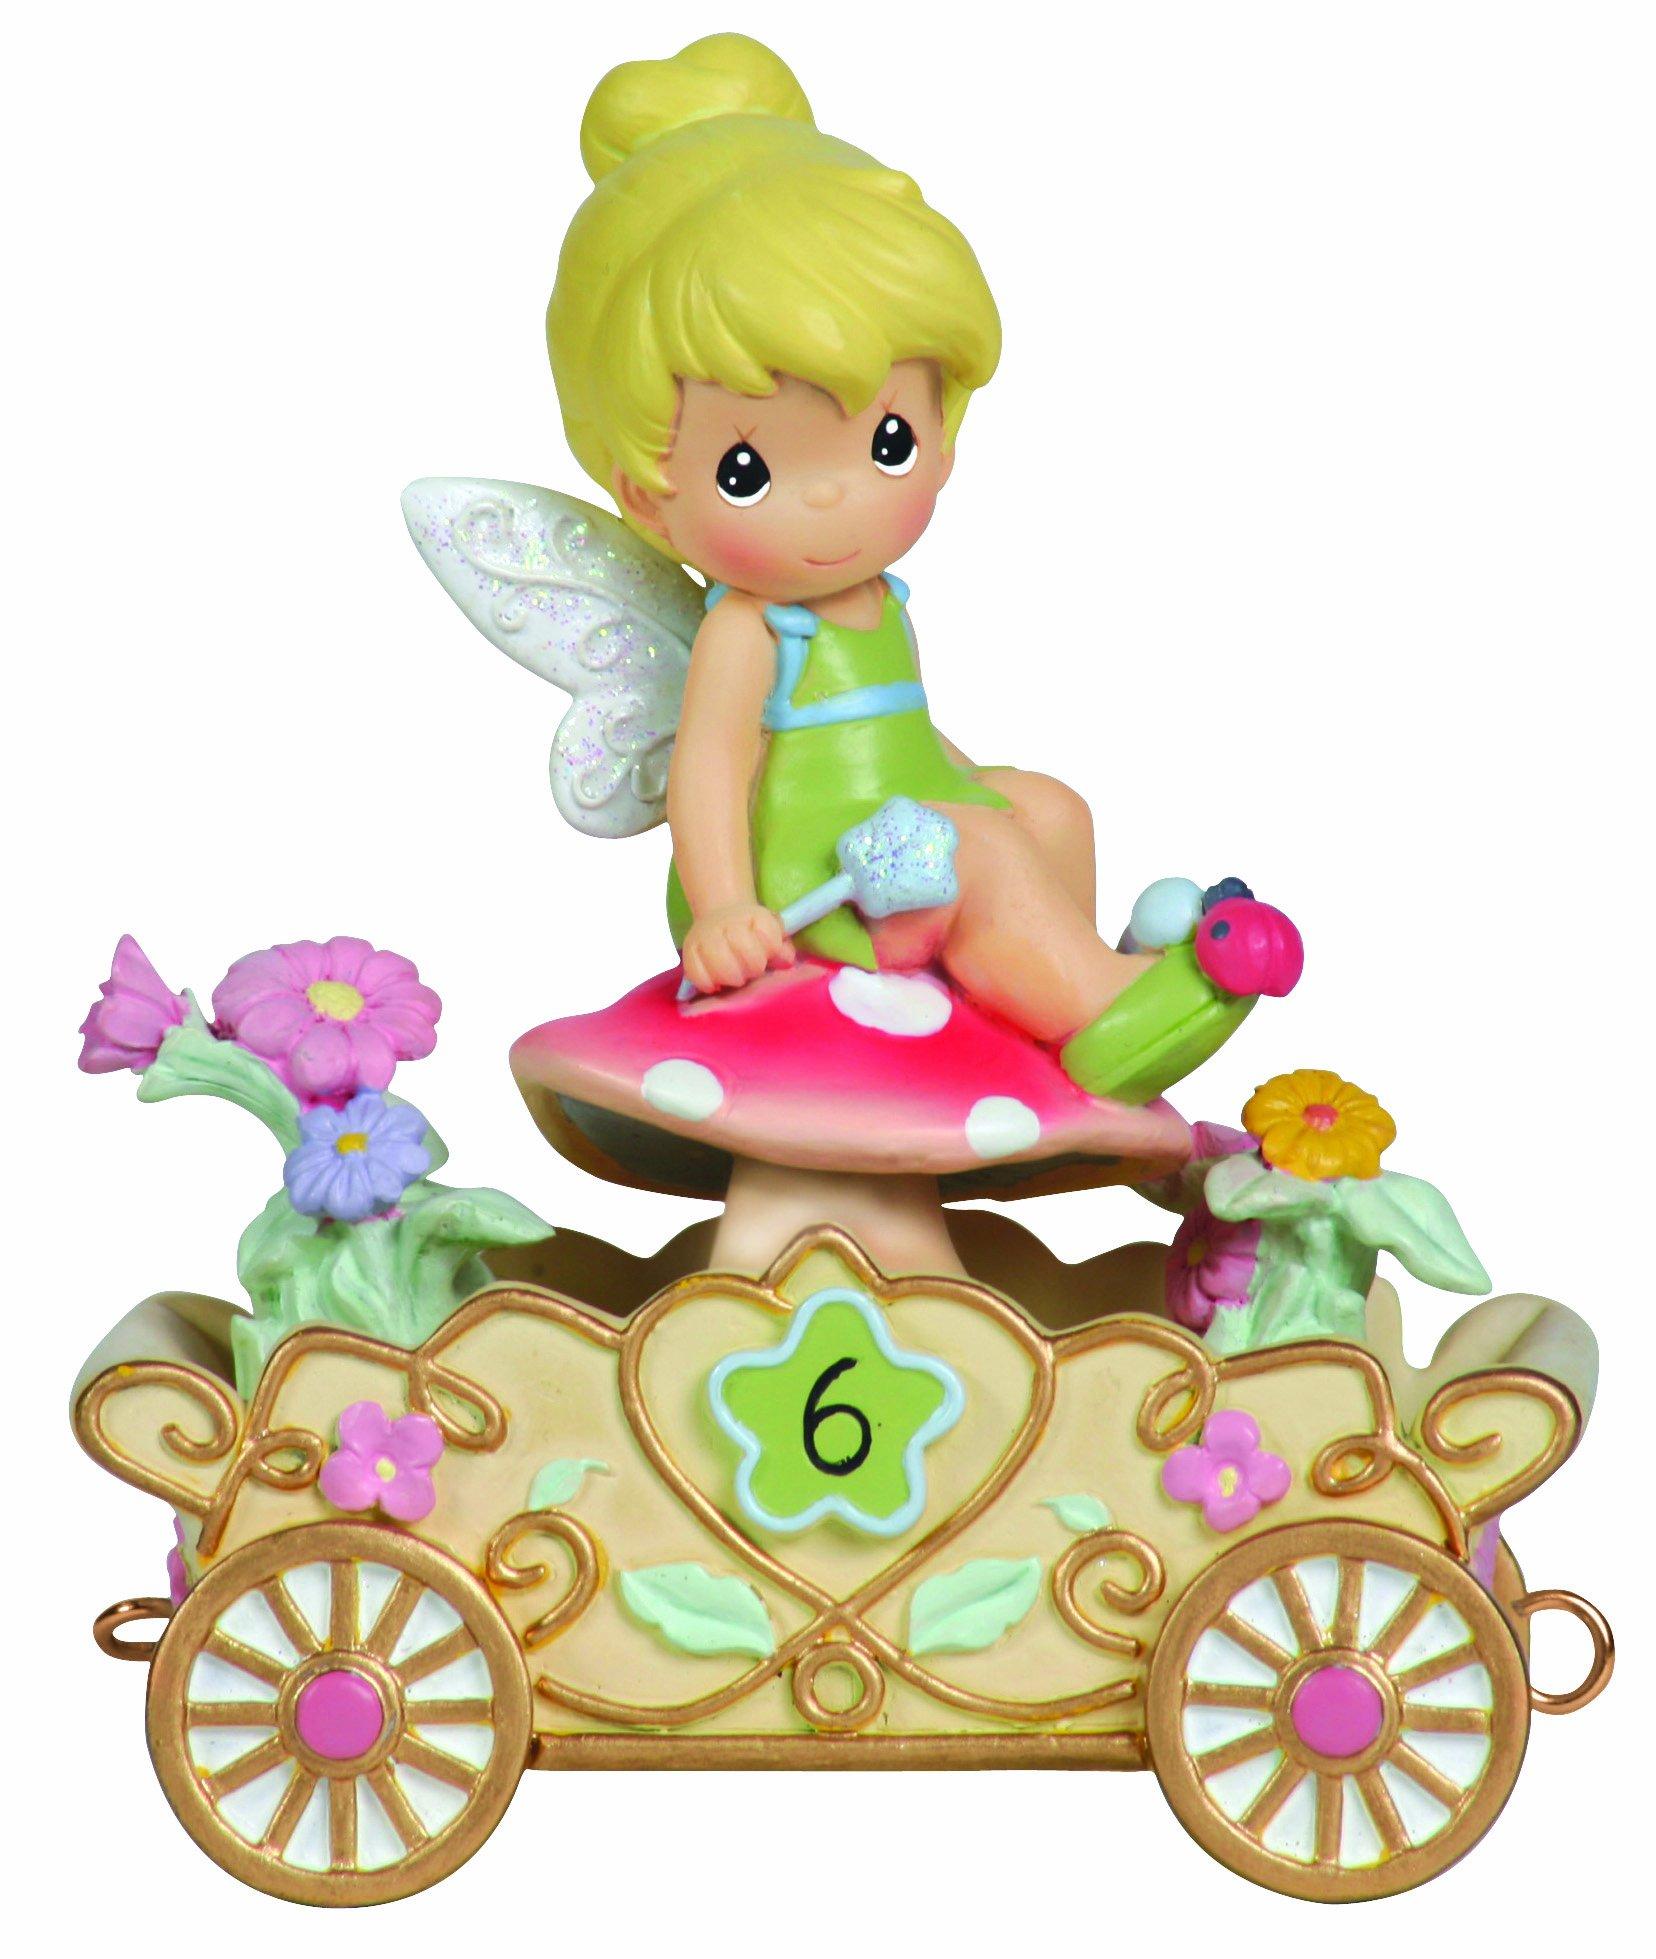 Precious Moments, Disney Showcase Collection,  Have A Fairy Happy Birthday, Disney Birthday Parade, Age 6, Resin Figurine, 104408 by Precious Moments